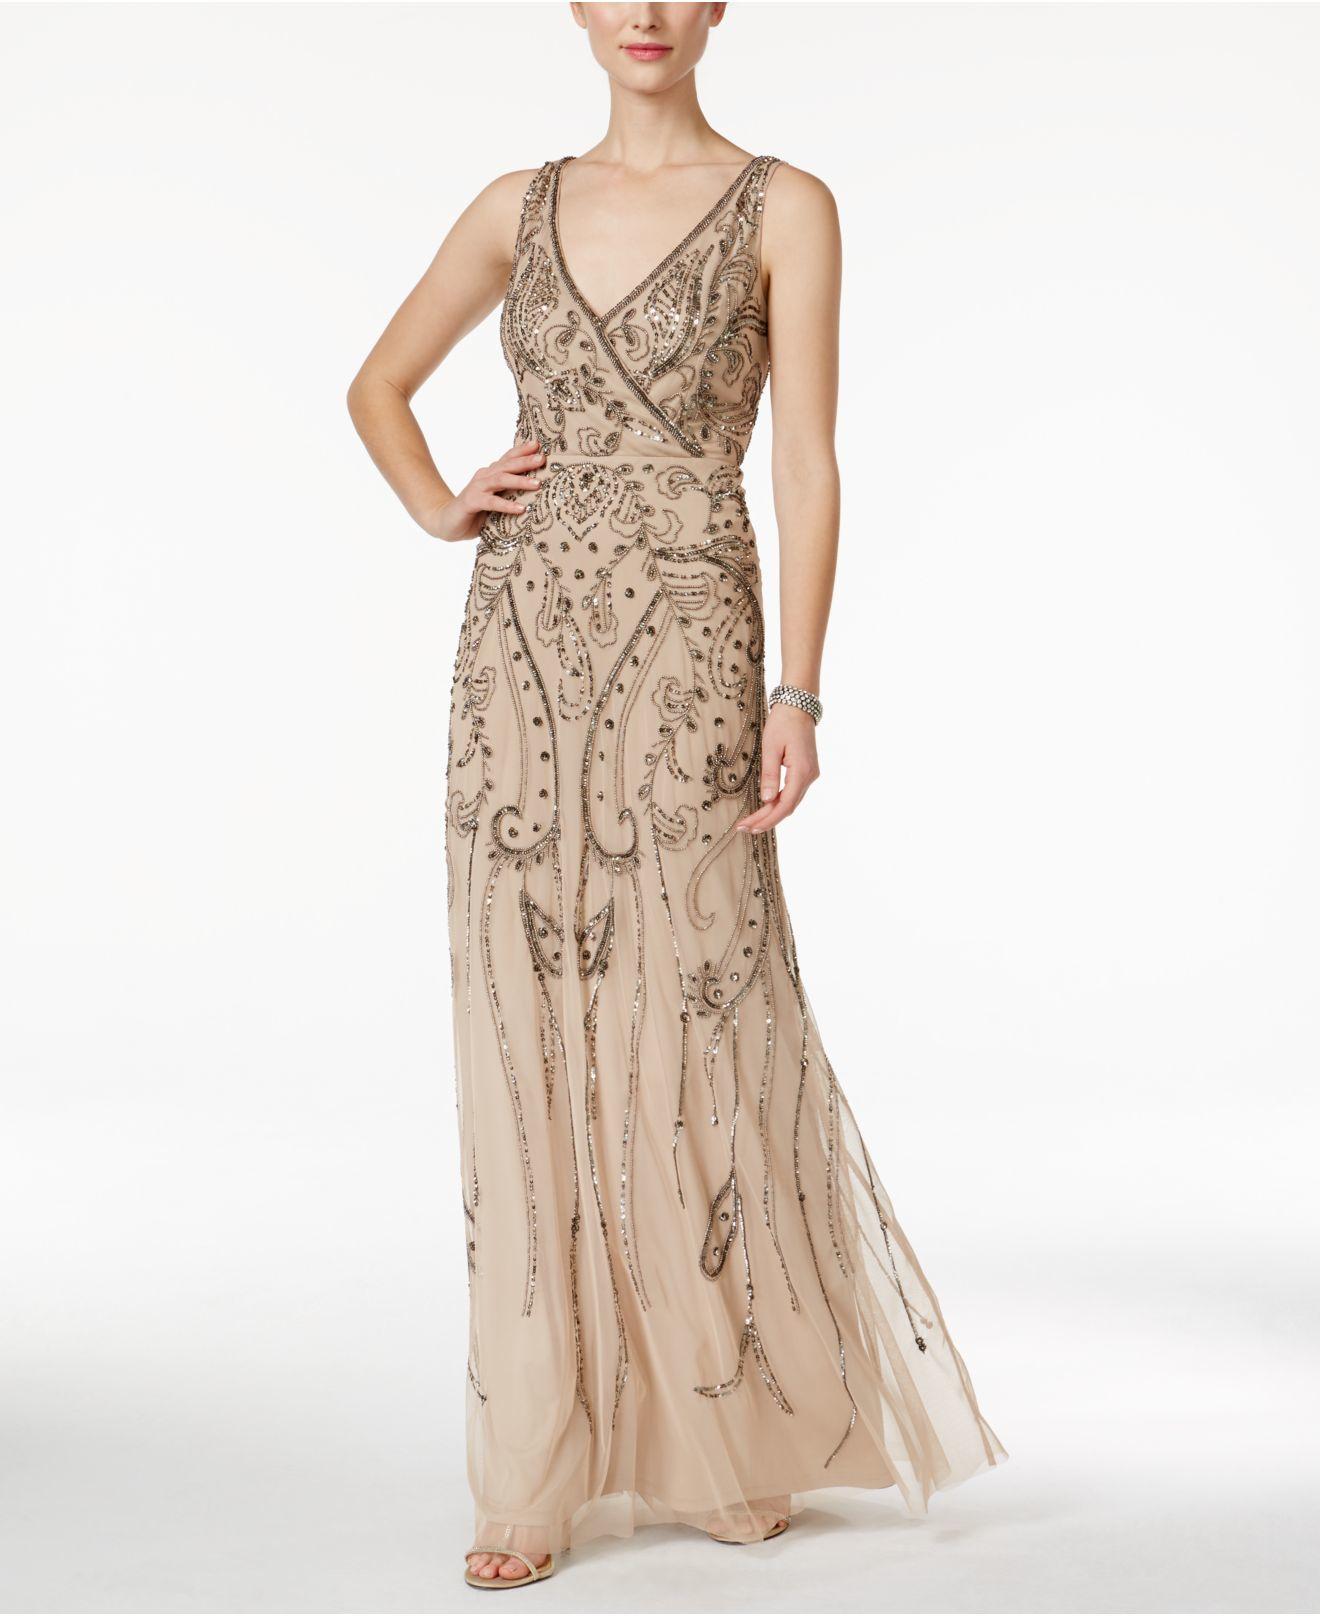 Lyst - Adrianna Papell Beaded Surplice Evening Gown in Metallic